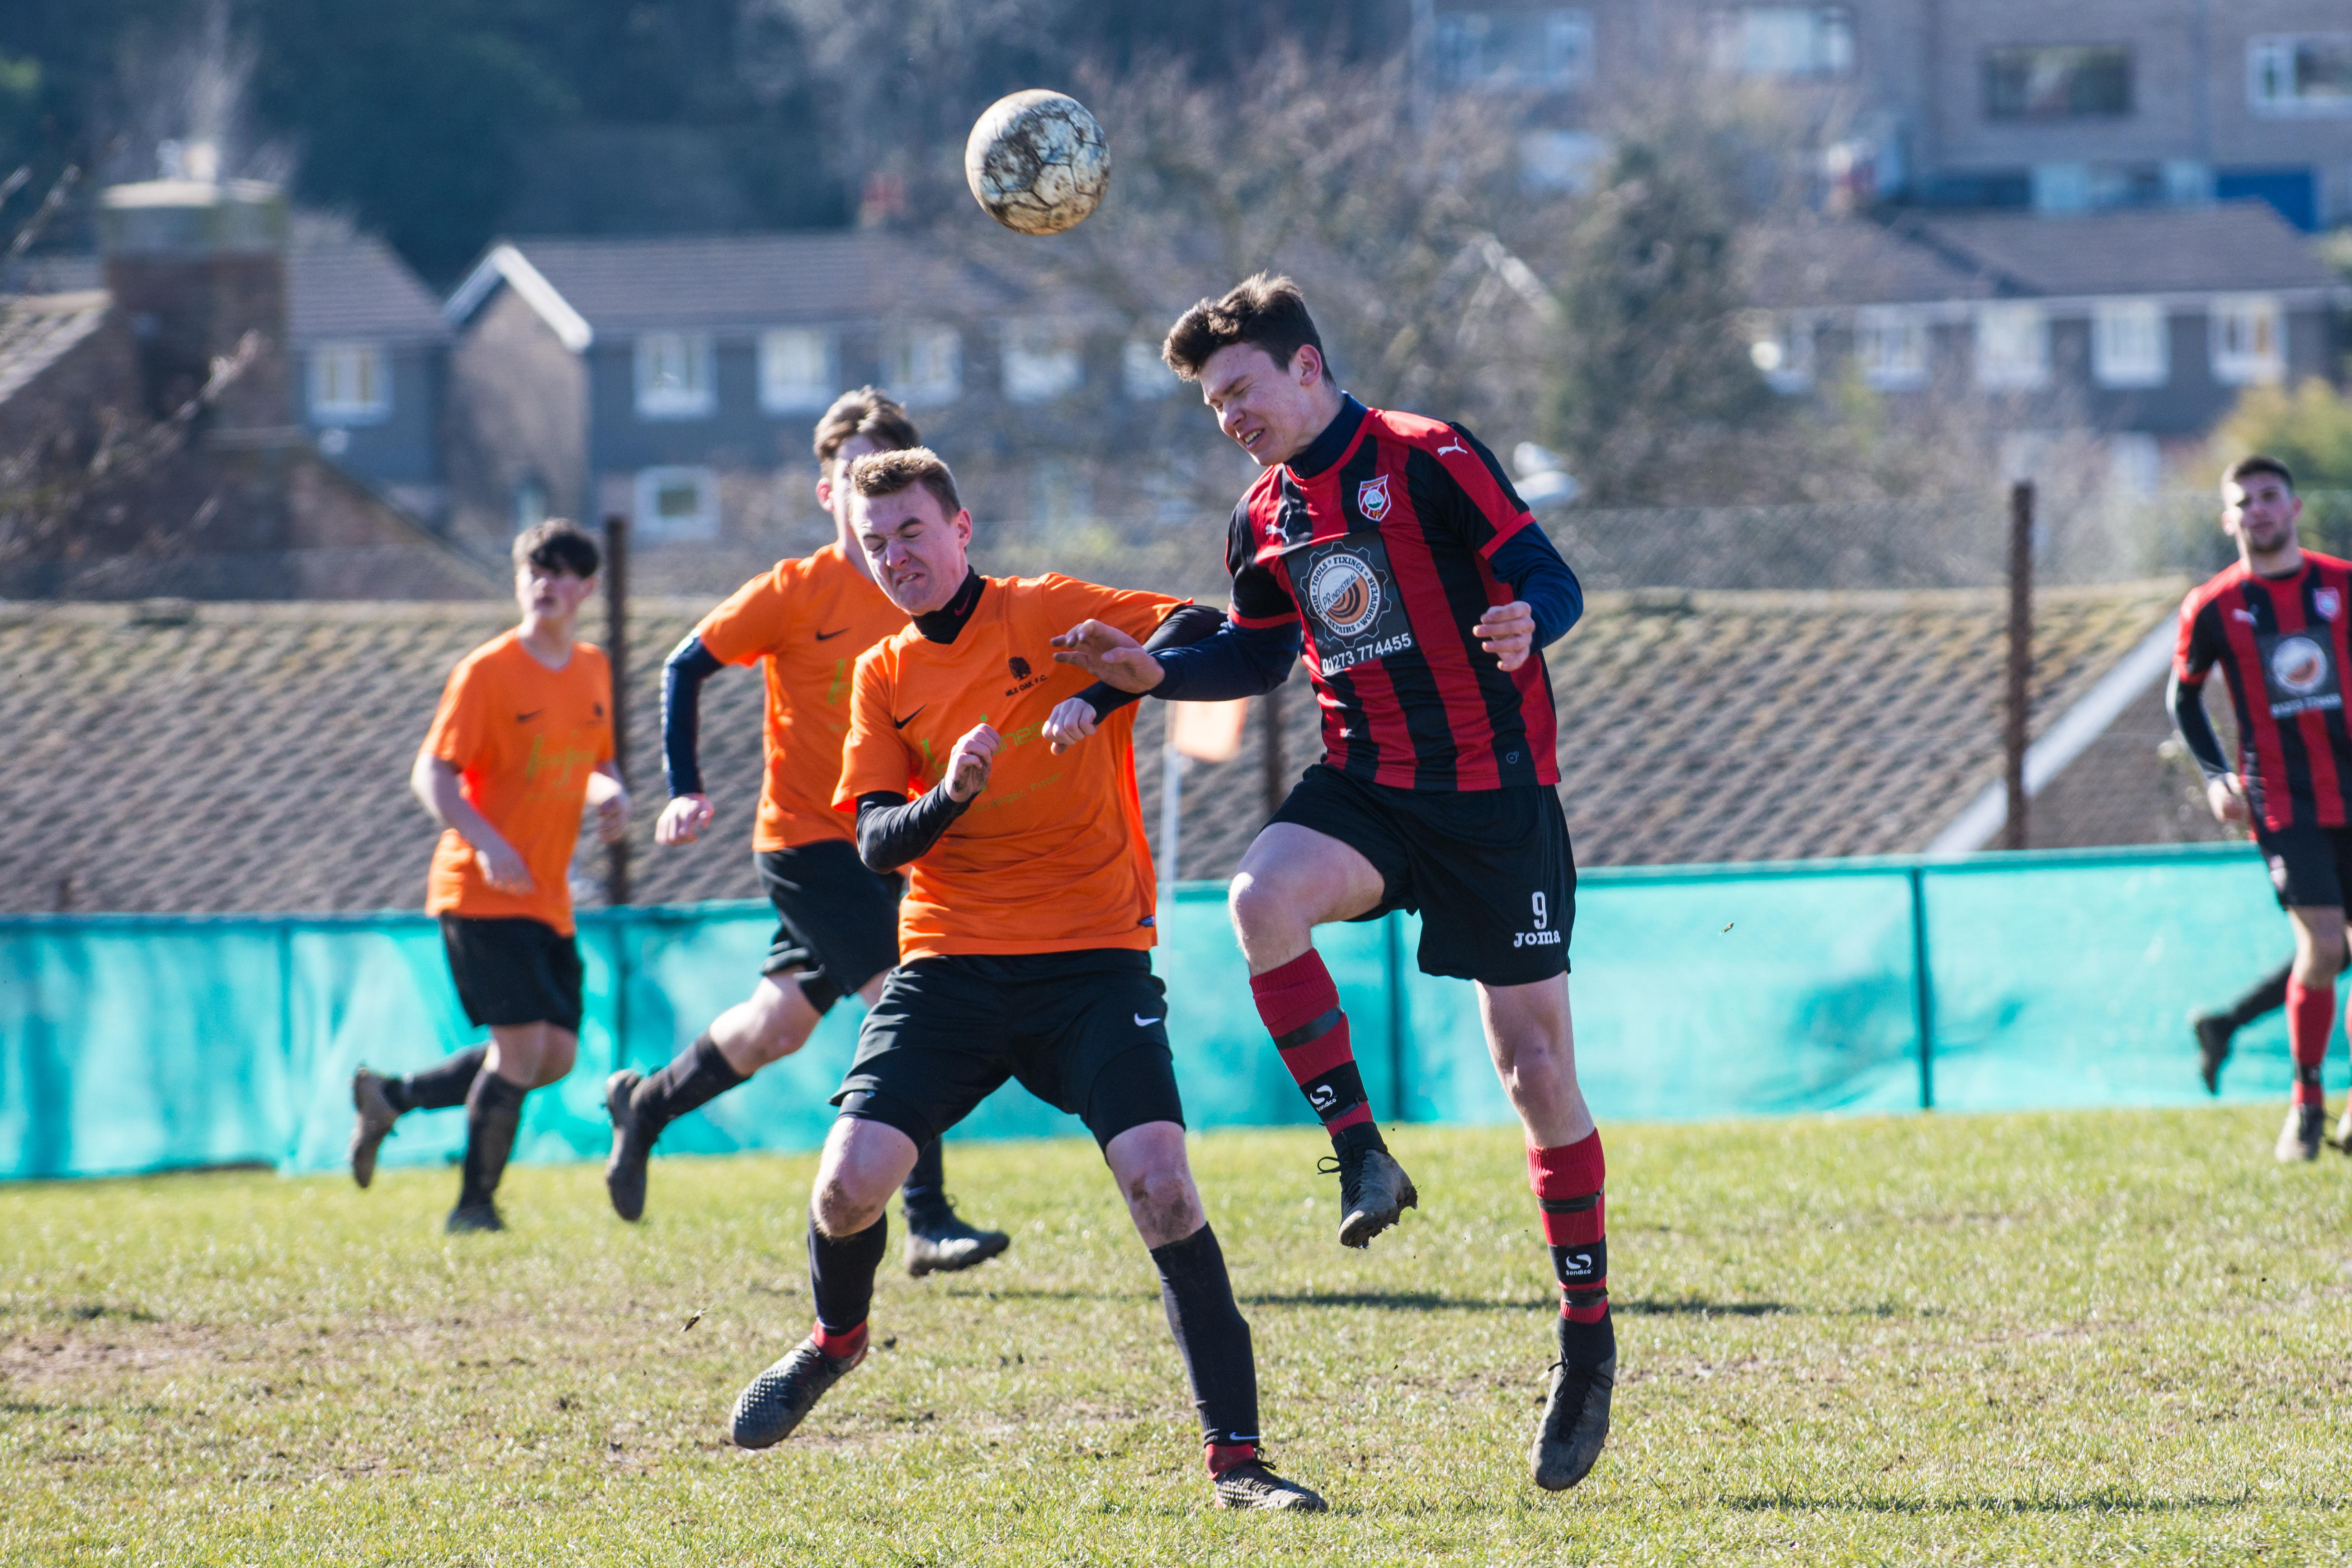 Mile Oak FC U18s vs Southwick FC U18s 25.02.18 20 DAVID_JEFFERY